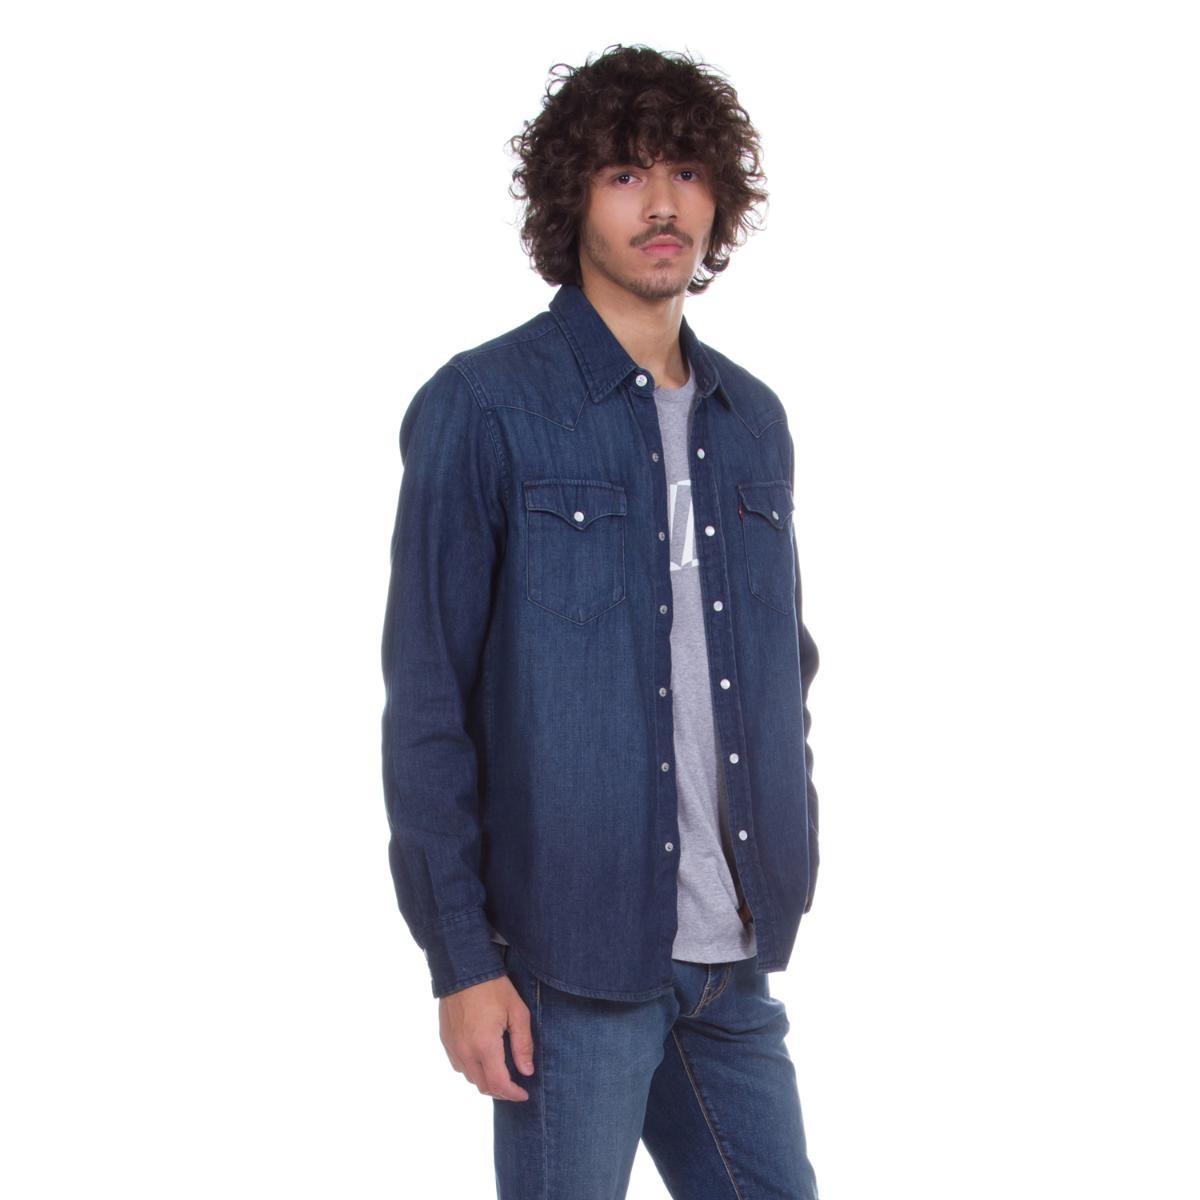 03273a8bfc camisa jeans levis masculina classic western indigo. Carregando zoom.